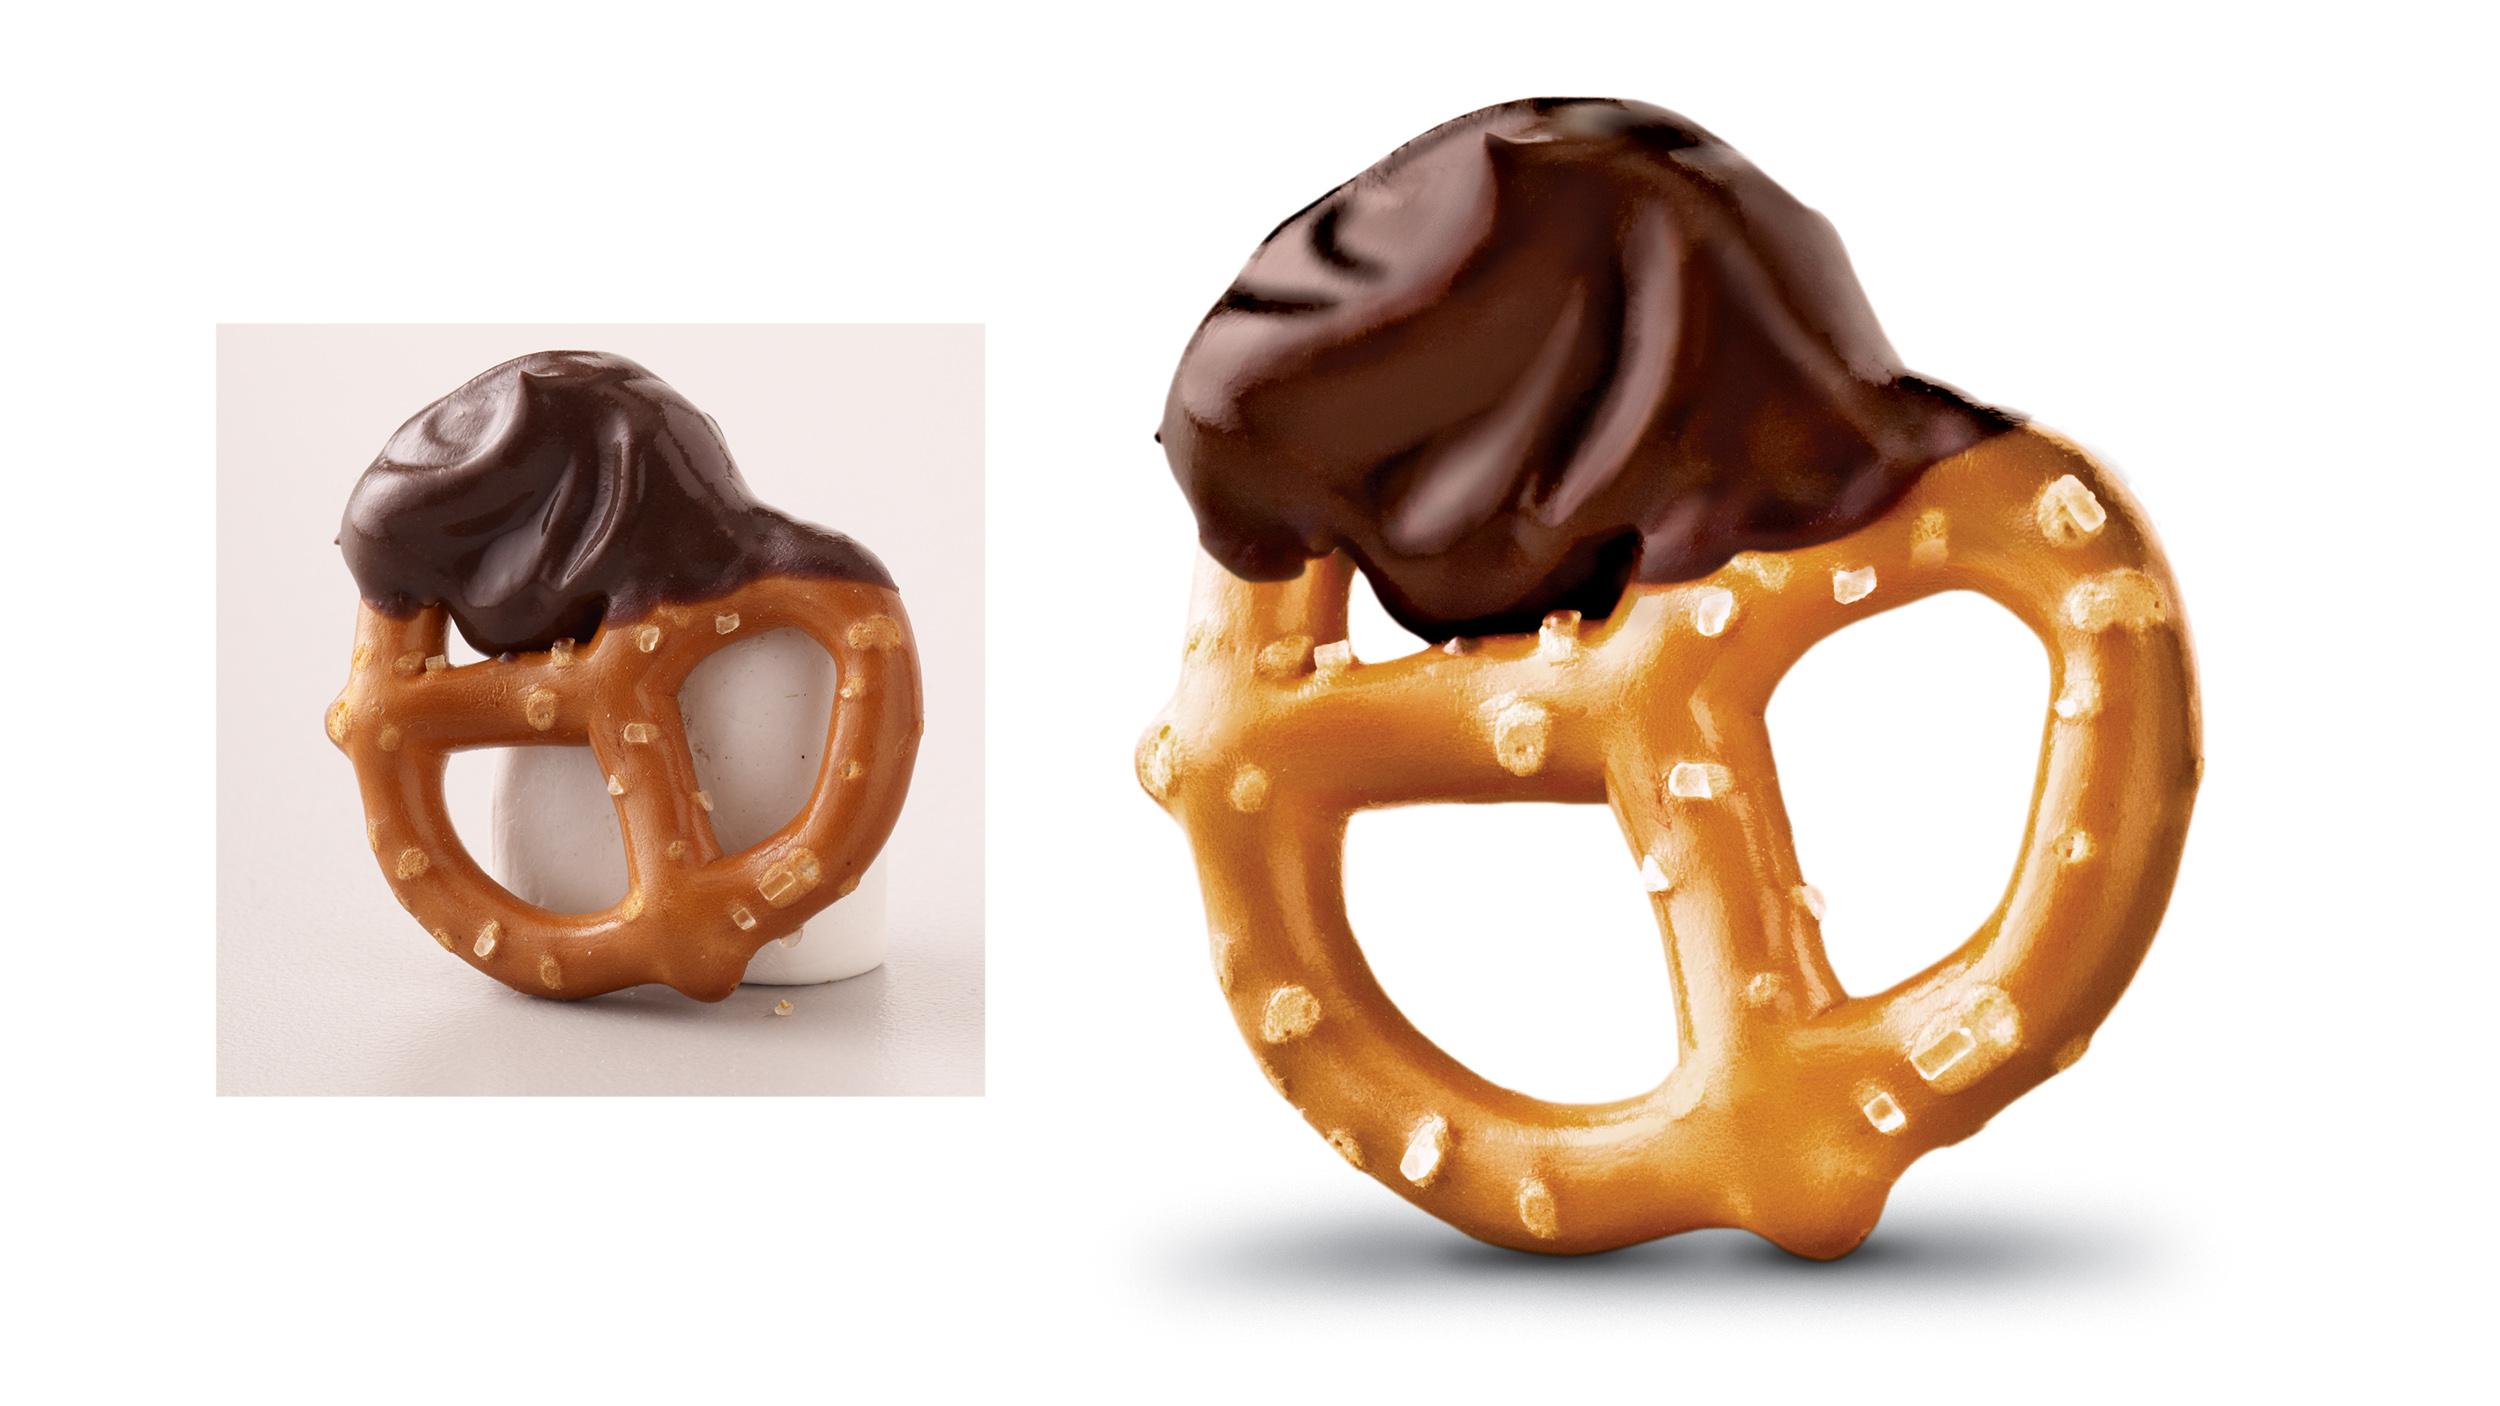 chocolate-pretzel-Creative-imageing-BigFishGraphicDesign.jpg